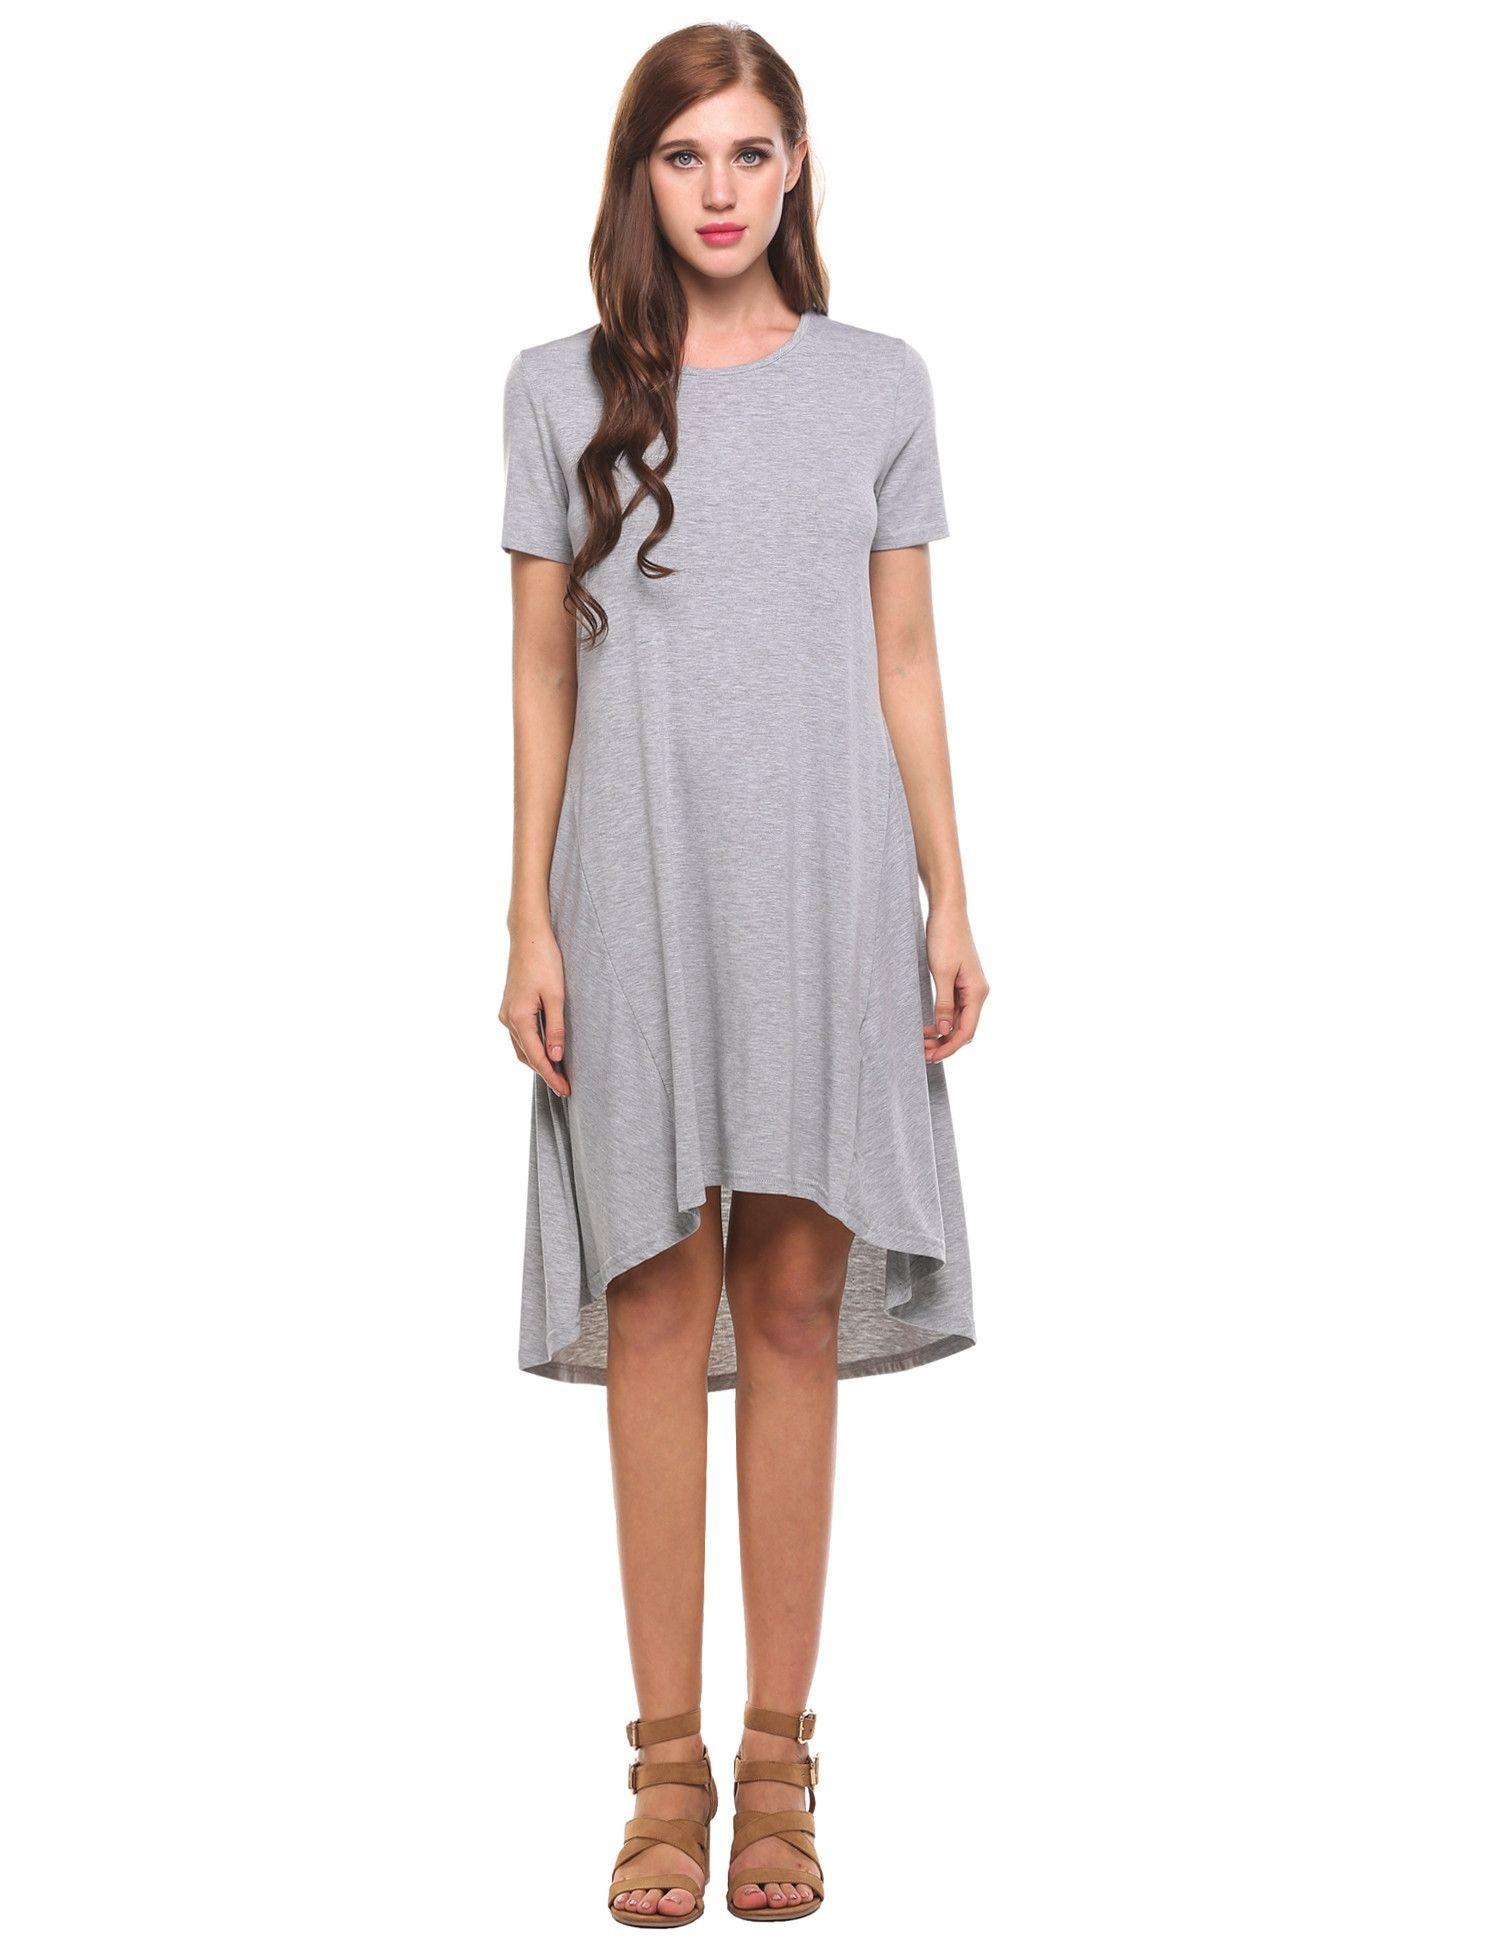 Pastel Short Sleeves Casual Dress